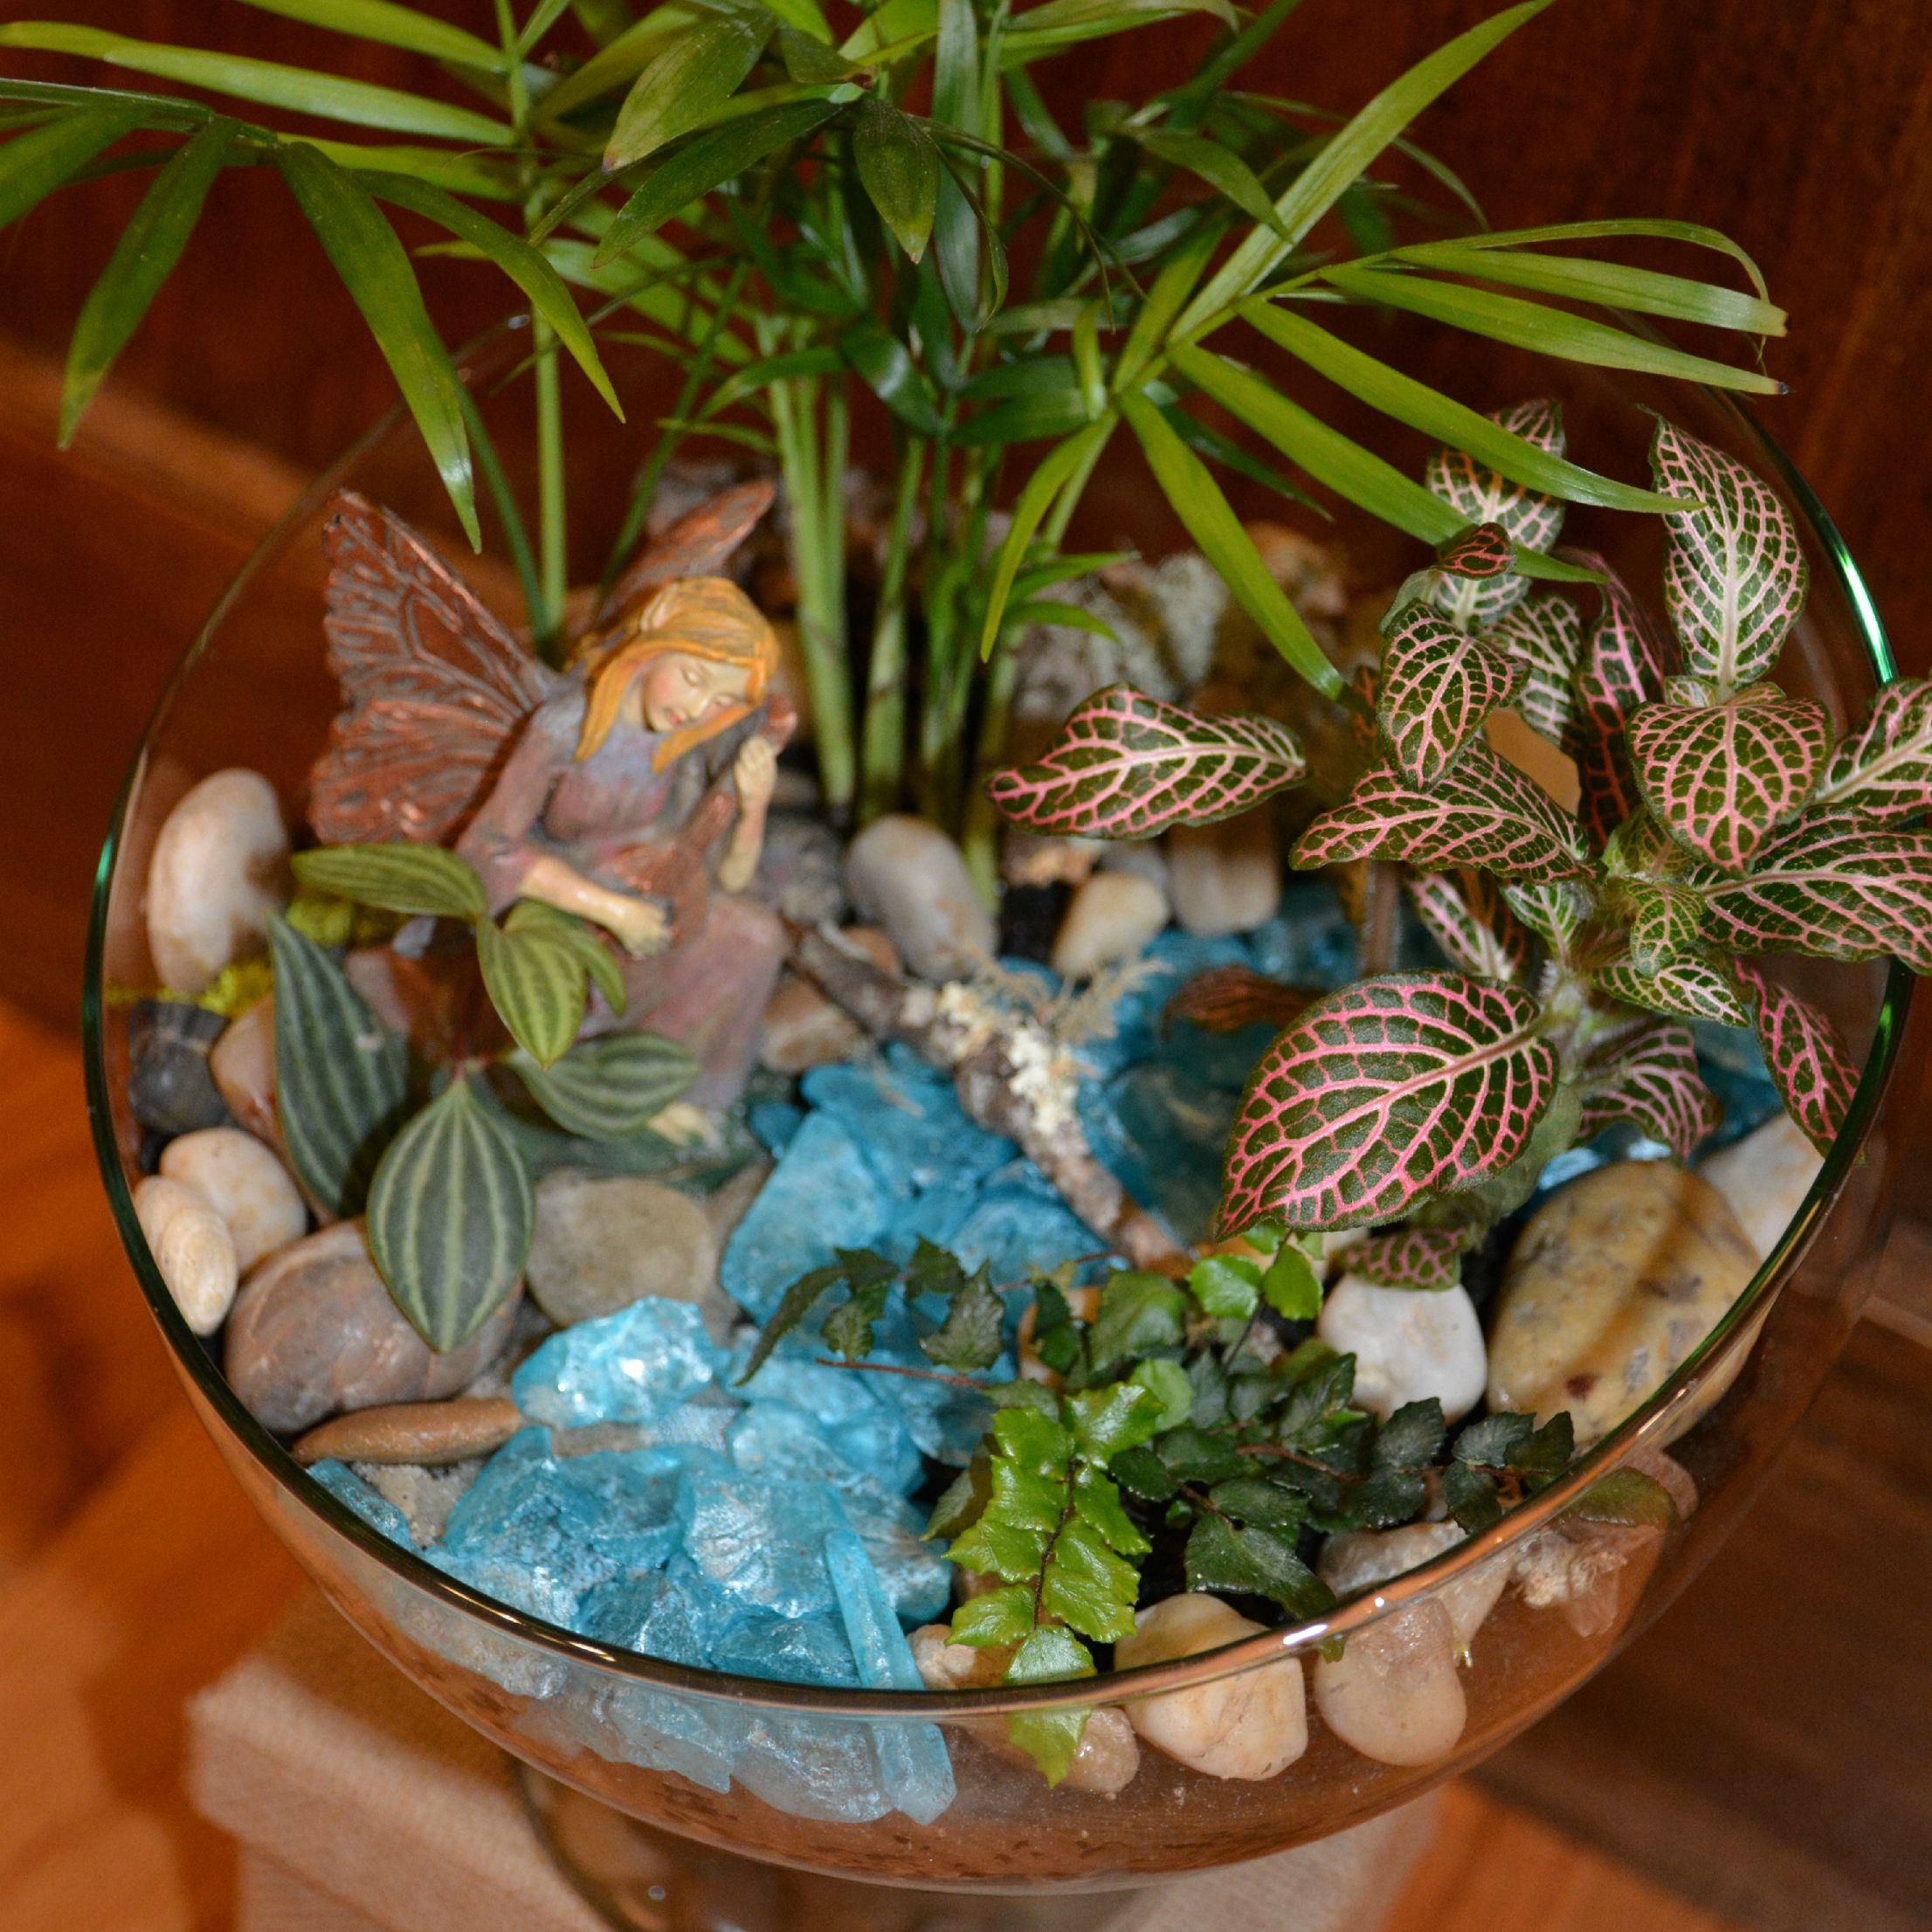 Socoolgiftsandaccessories - Terrarium - Fairy Garden - Perfect Gift For